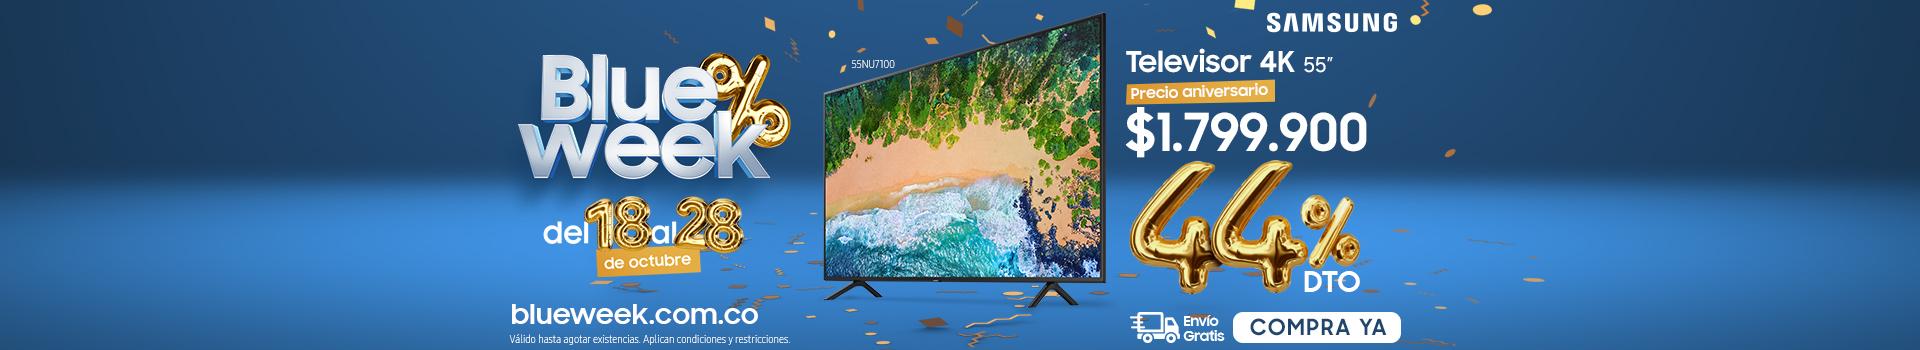 AK.KT-BCAT-7-TV-PP---Samsung-55NU7100-Oct18